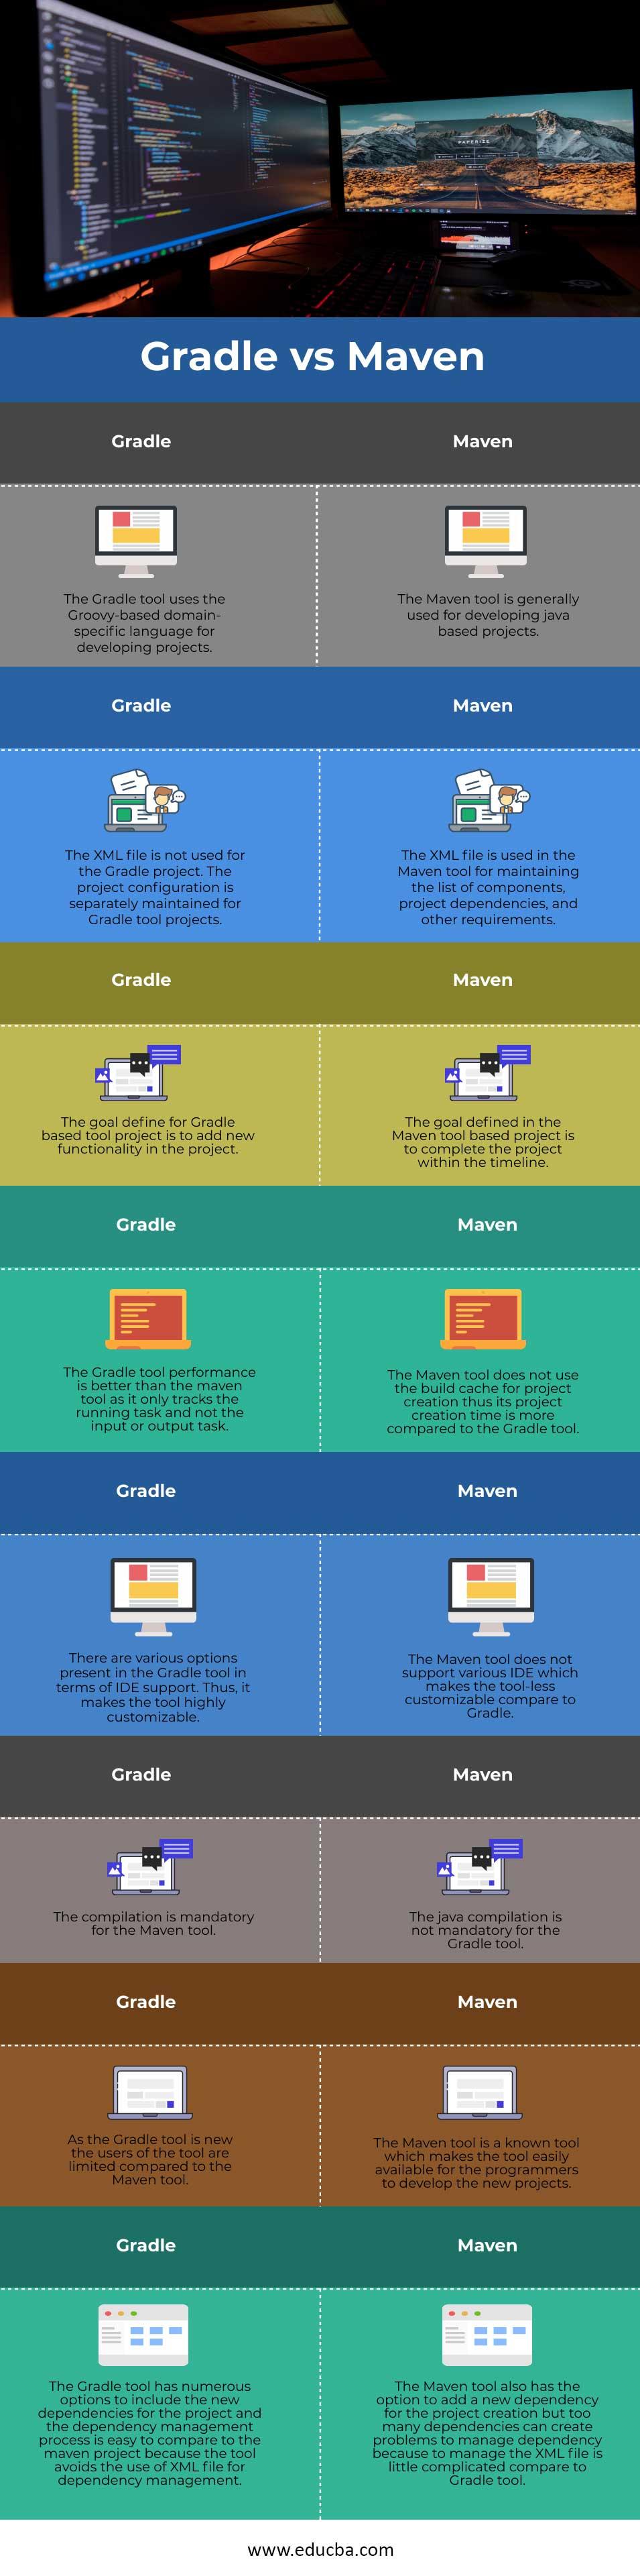 Gradle-vs-Maven-info